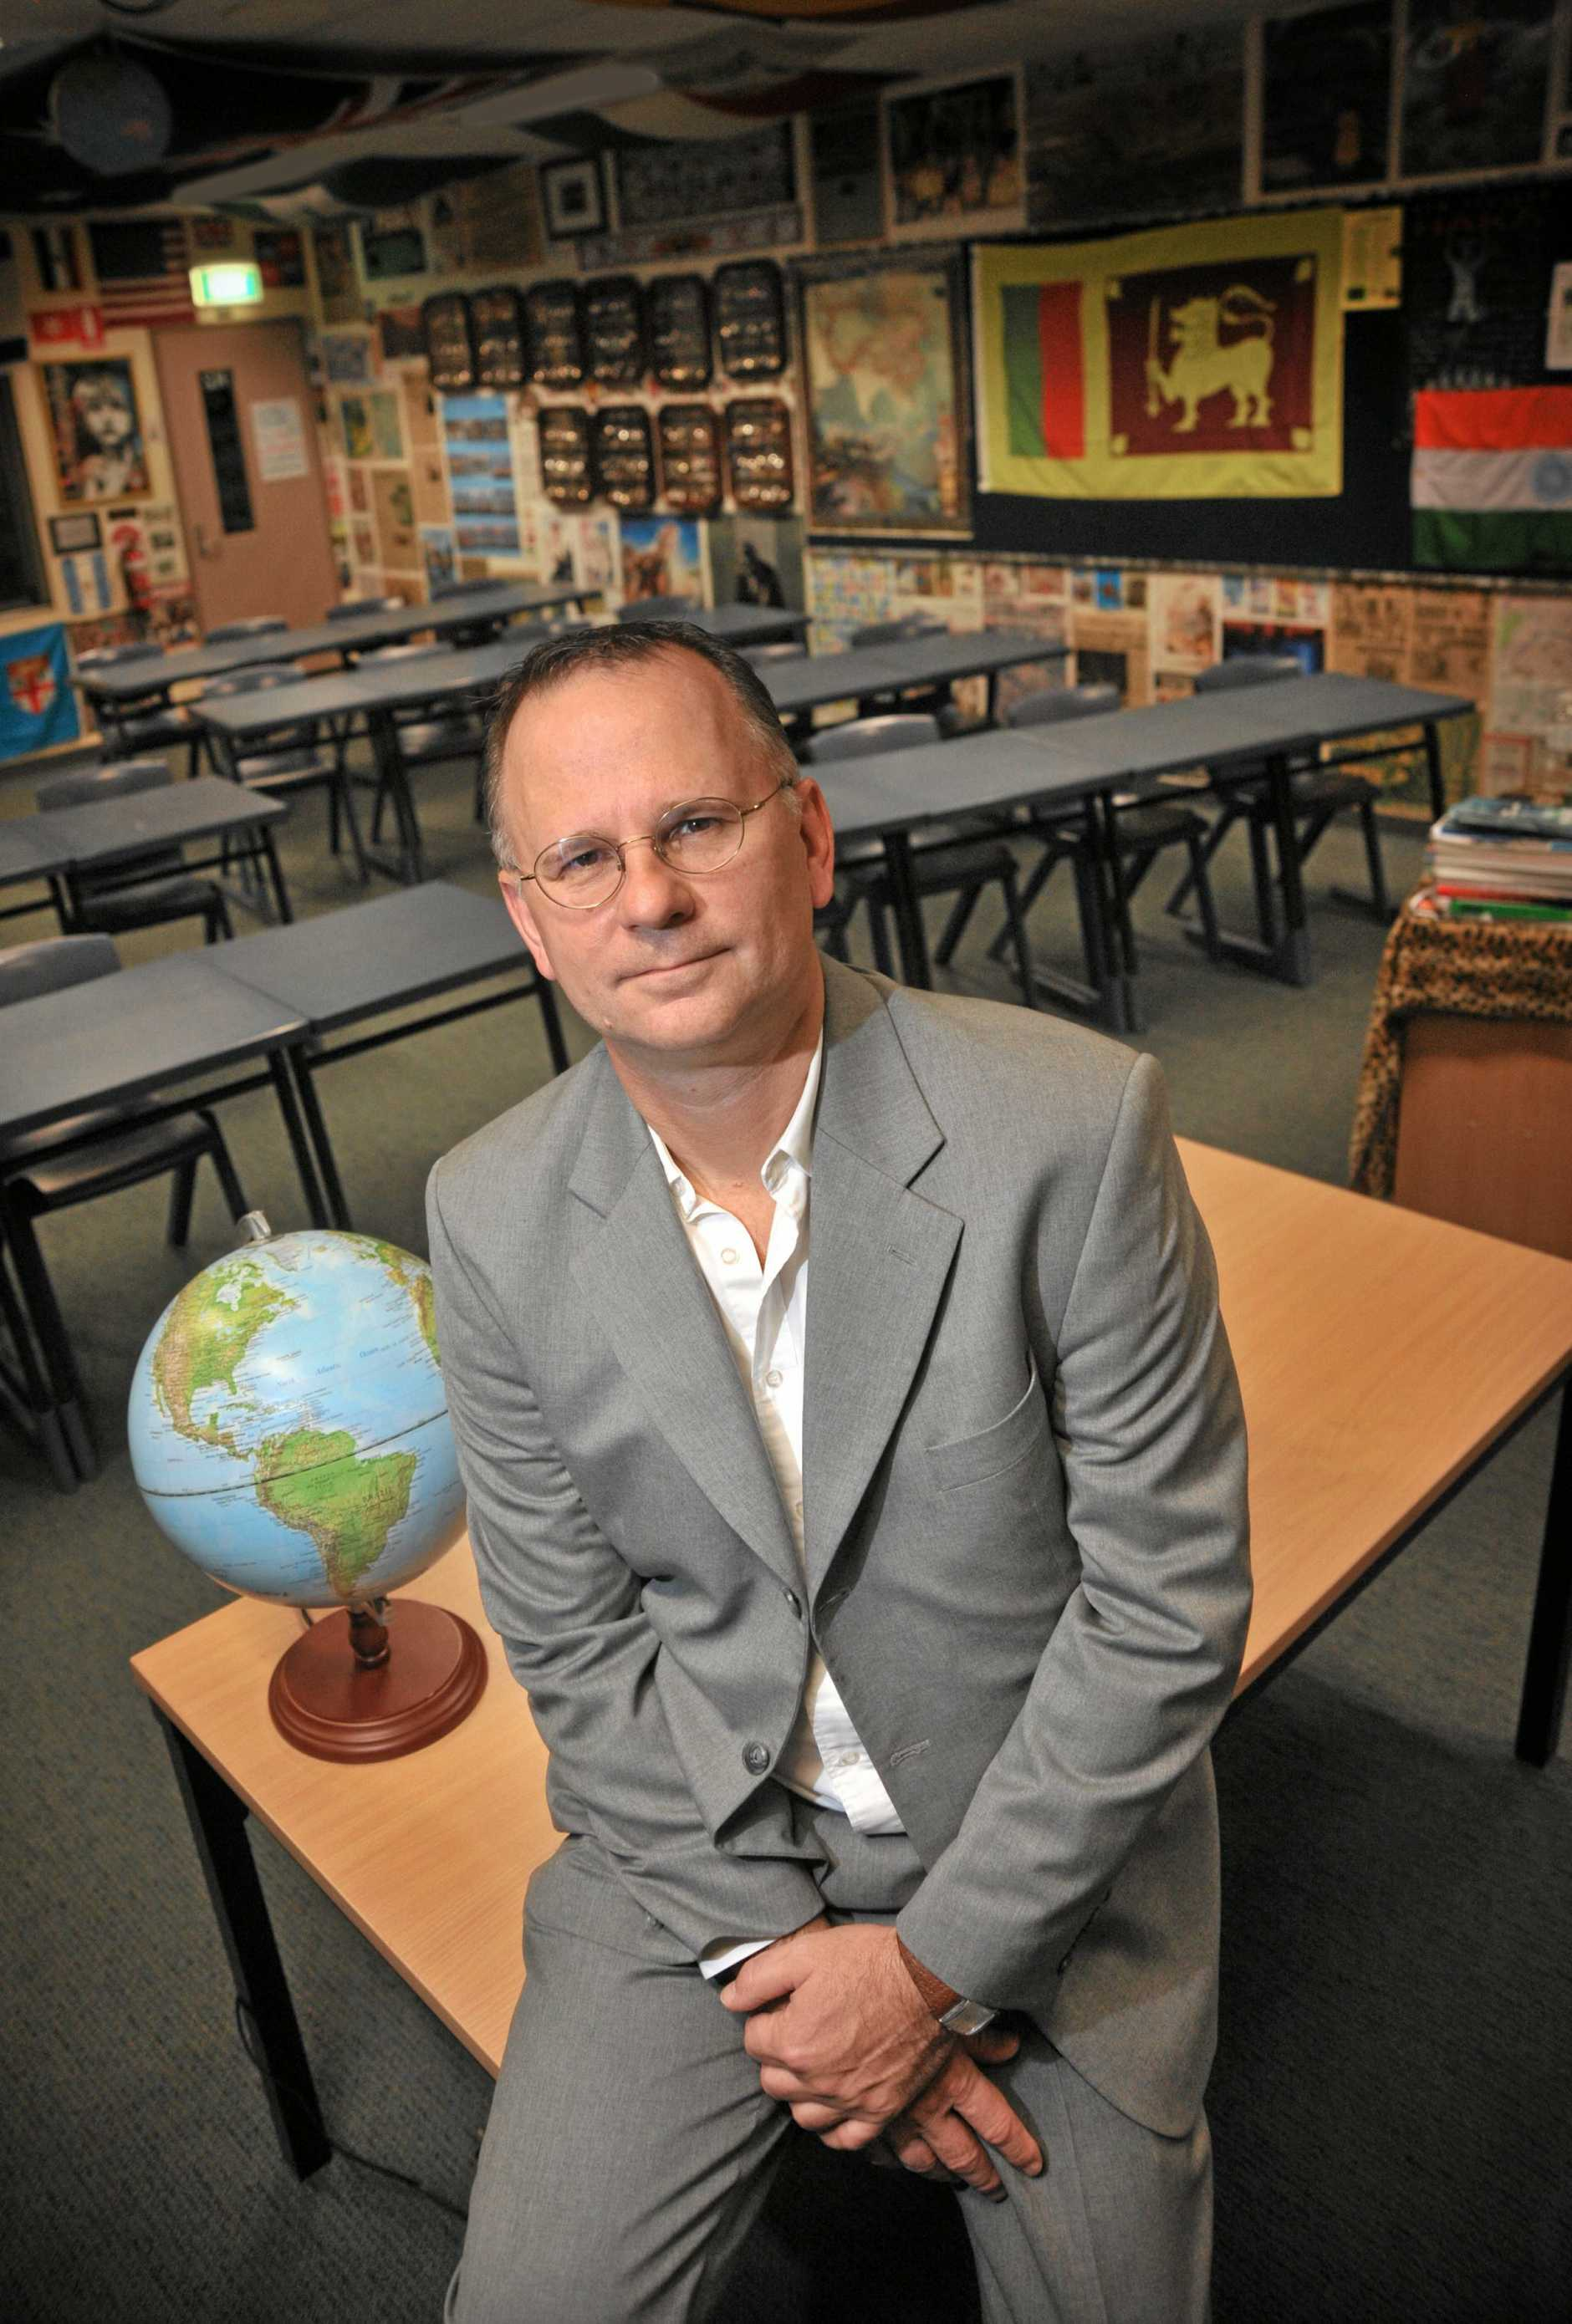 Dr Michael Nagel